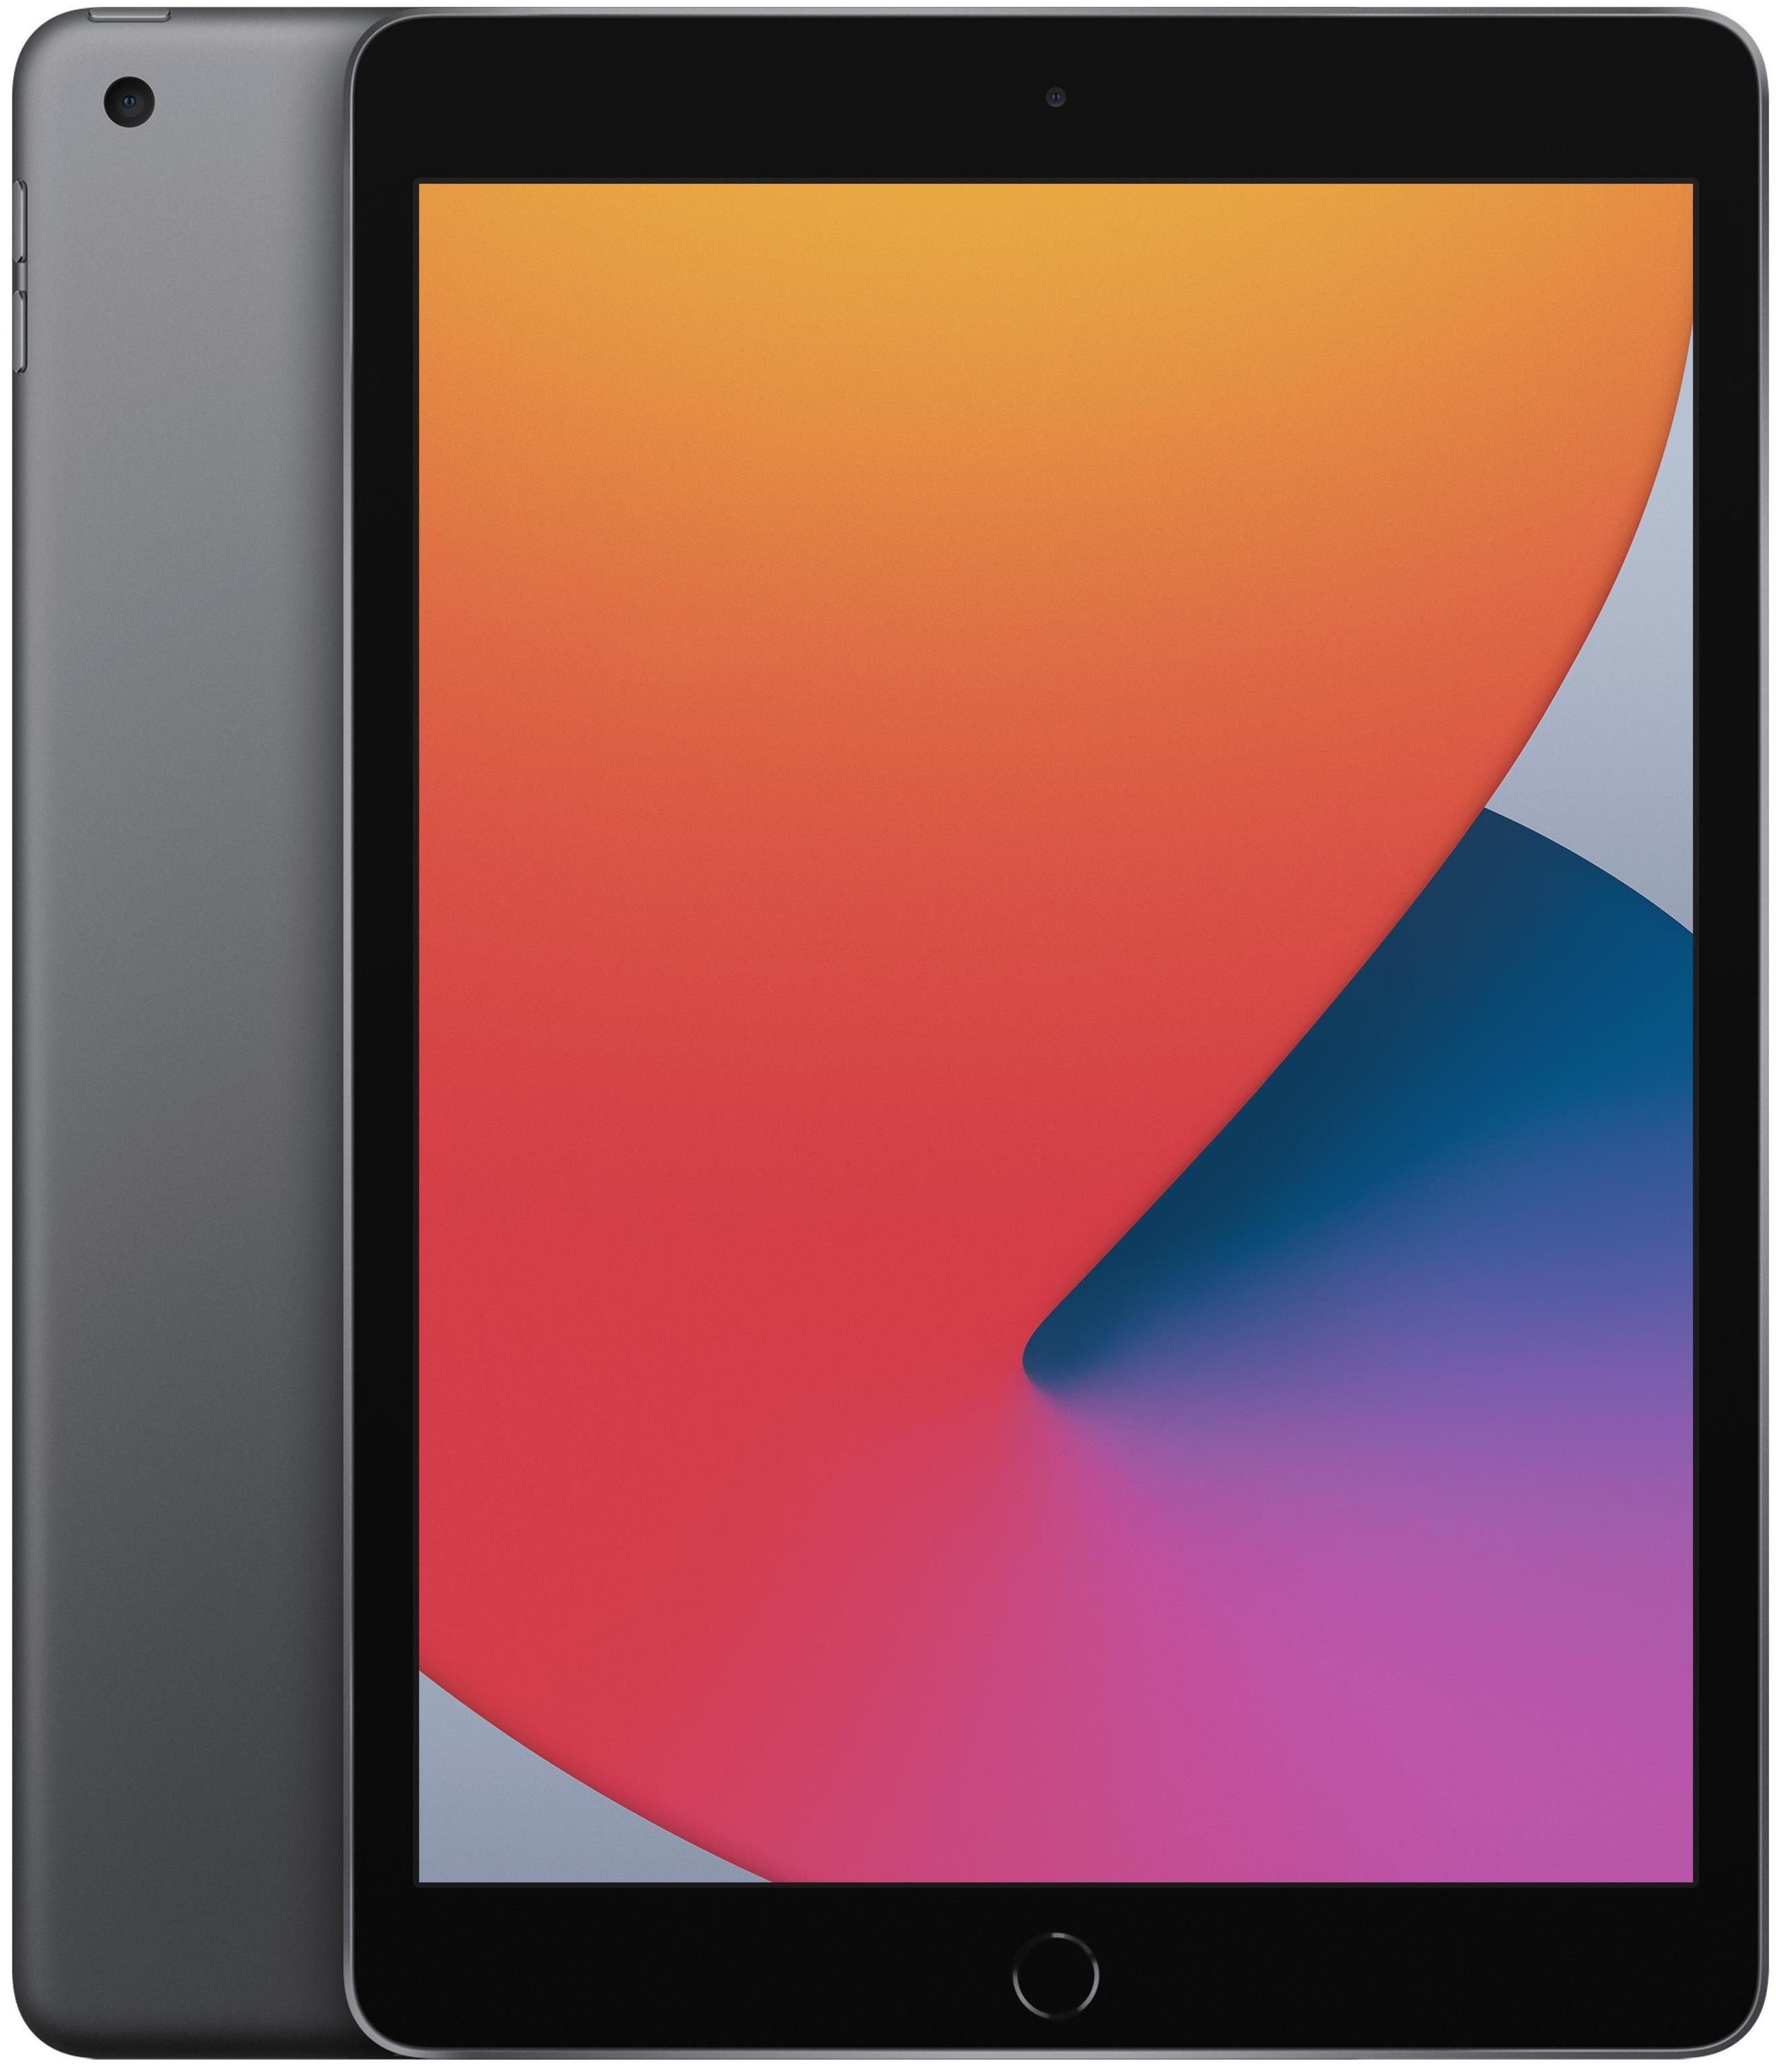 "Apple iPad (2020) 128Gb Wi-Fi - диагональ: 10.2"" (2160x1620) IPS"